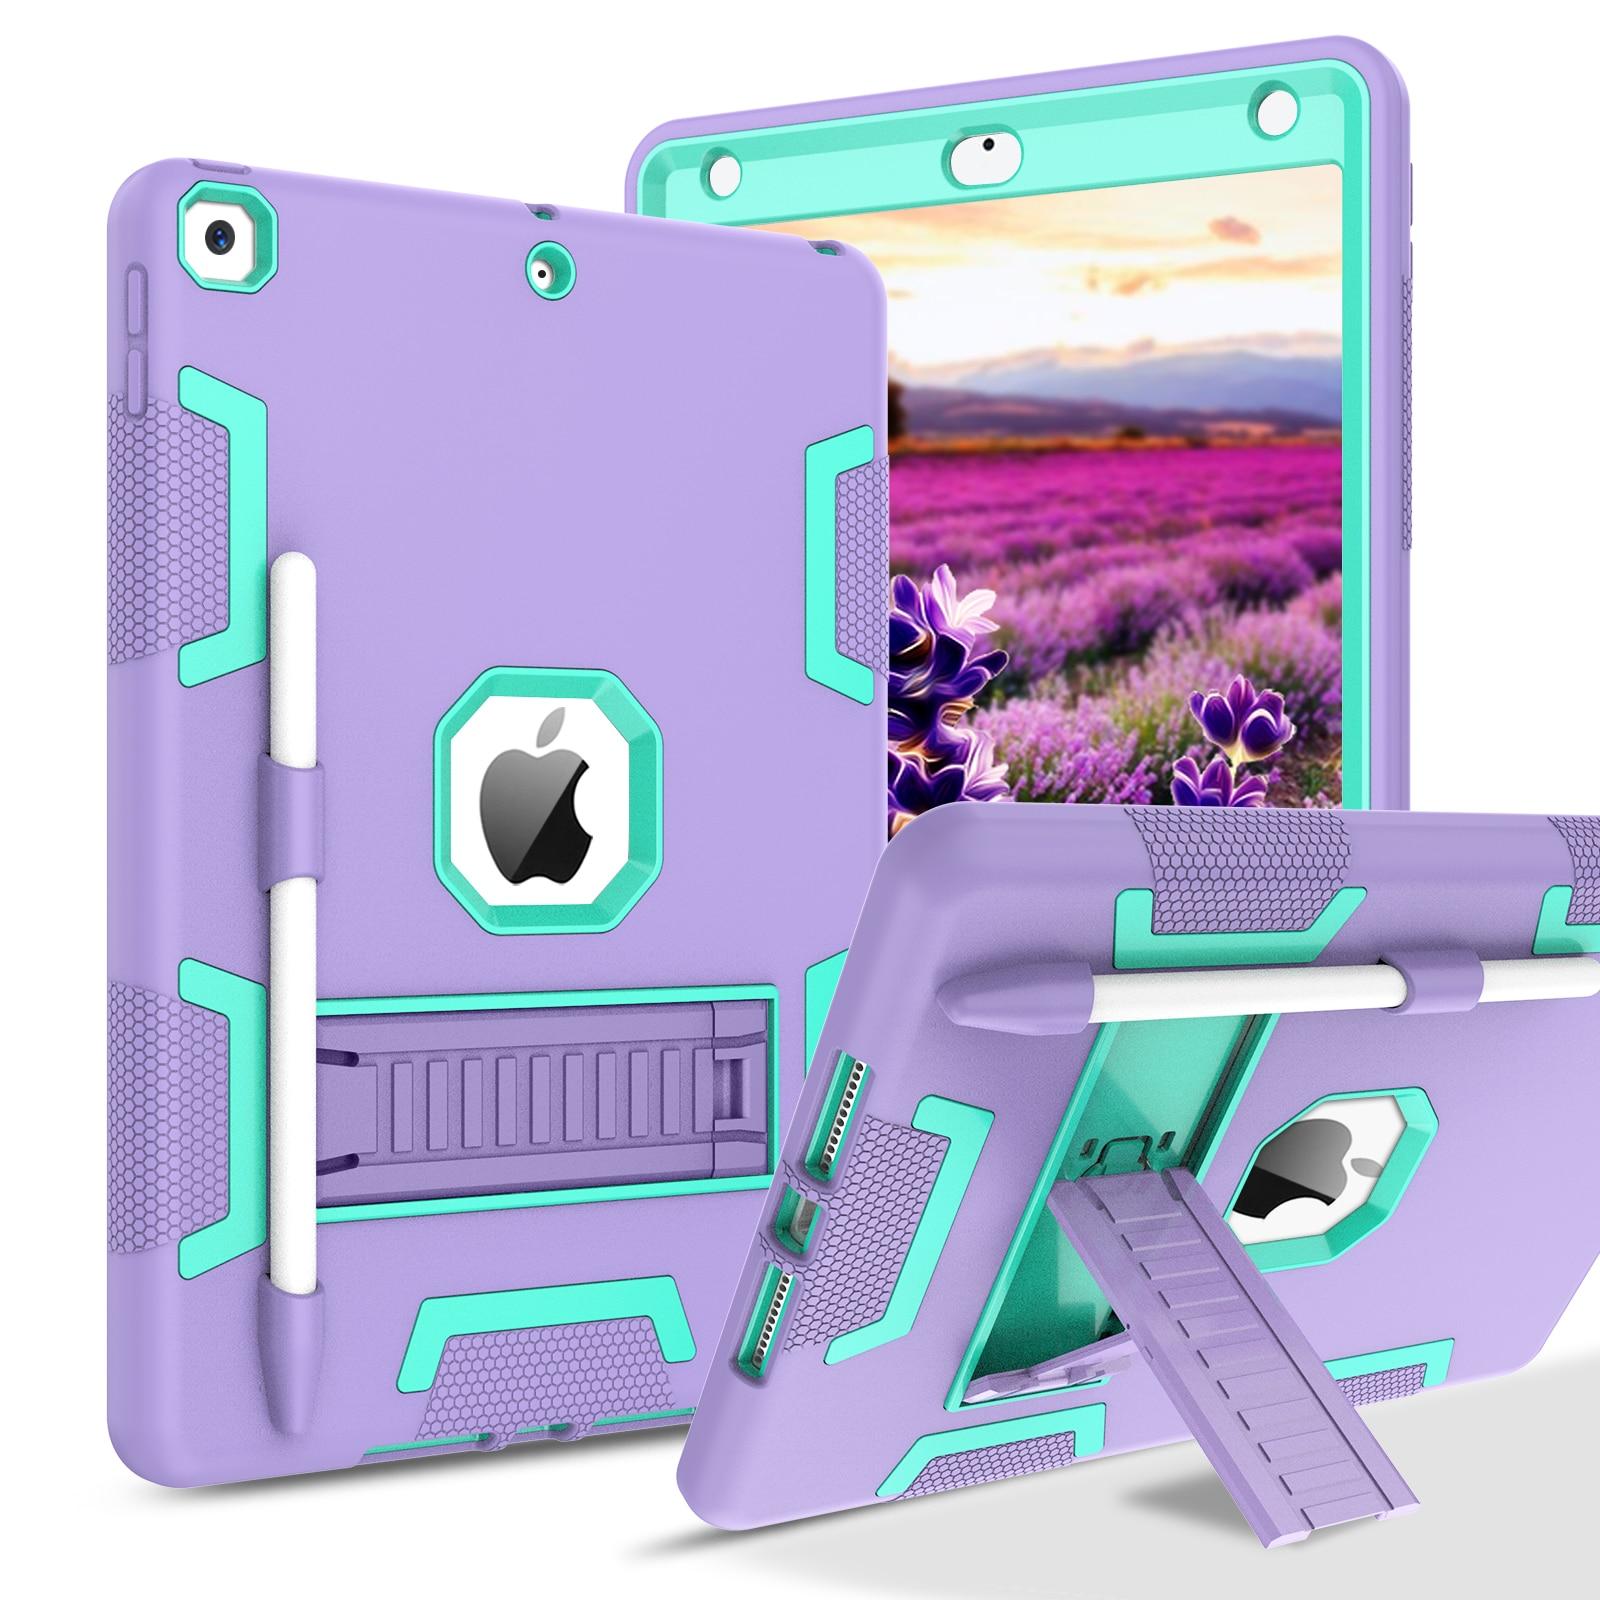 BENTOBEN لباد 8th 7th جيل واقية حافظة لجهاز iPad 10.2 2020/2019 3 في 1 الثقيلة للصدمات الغطاء الواقي Purpl